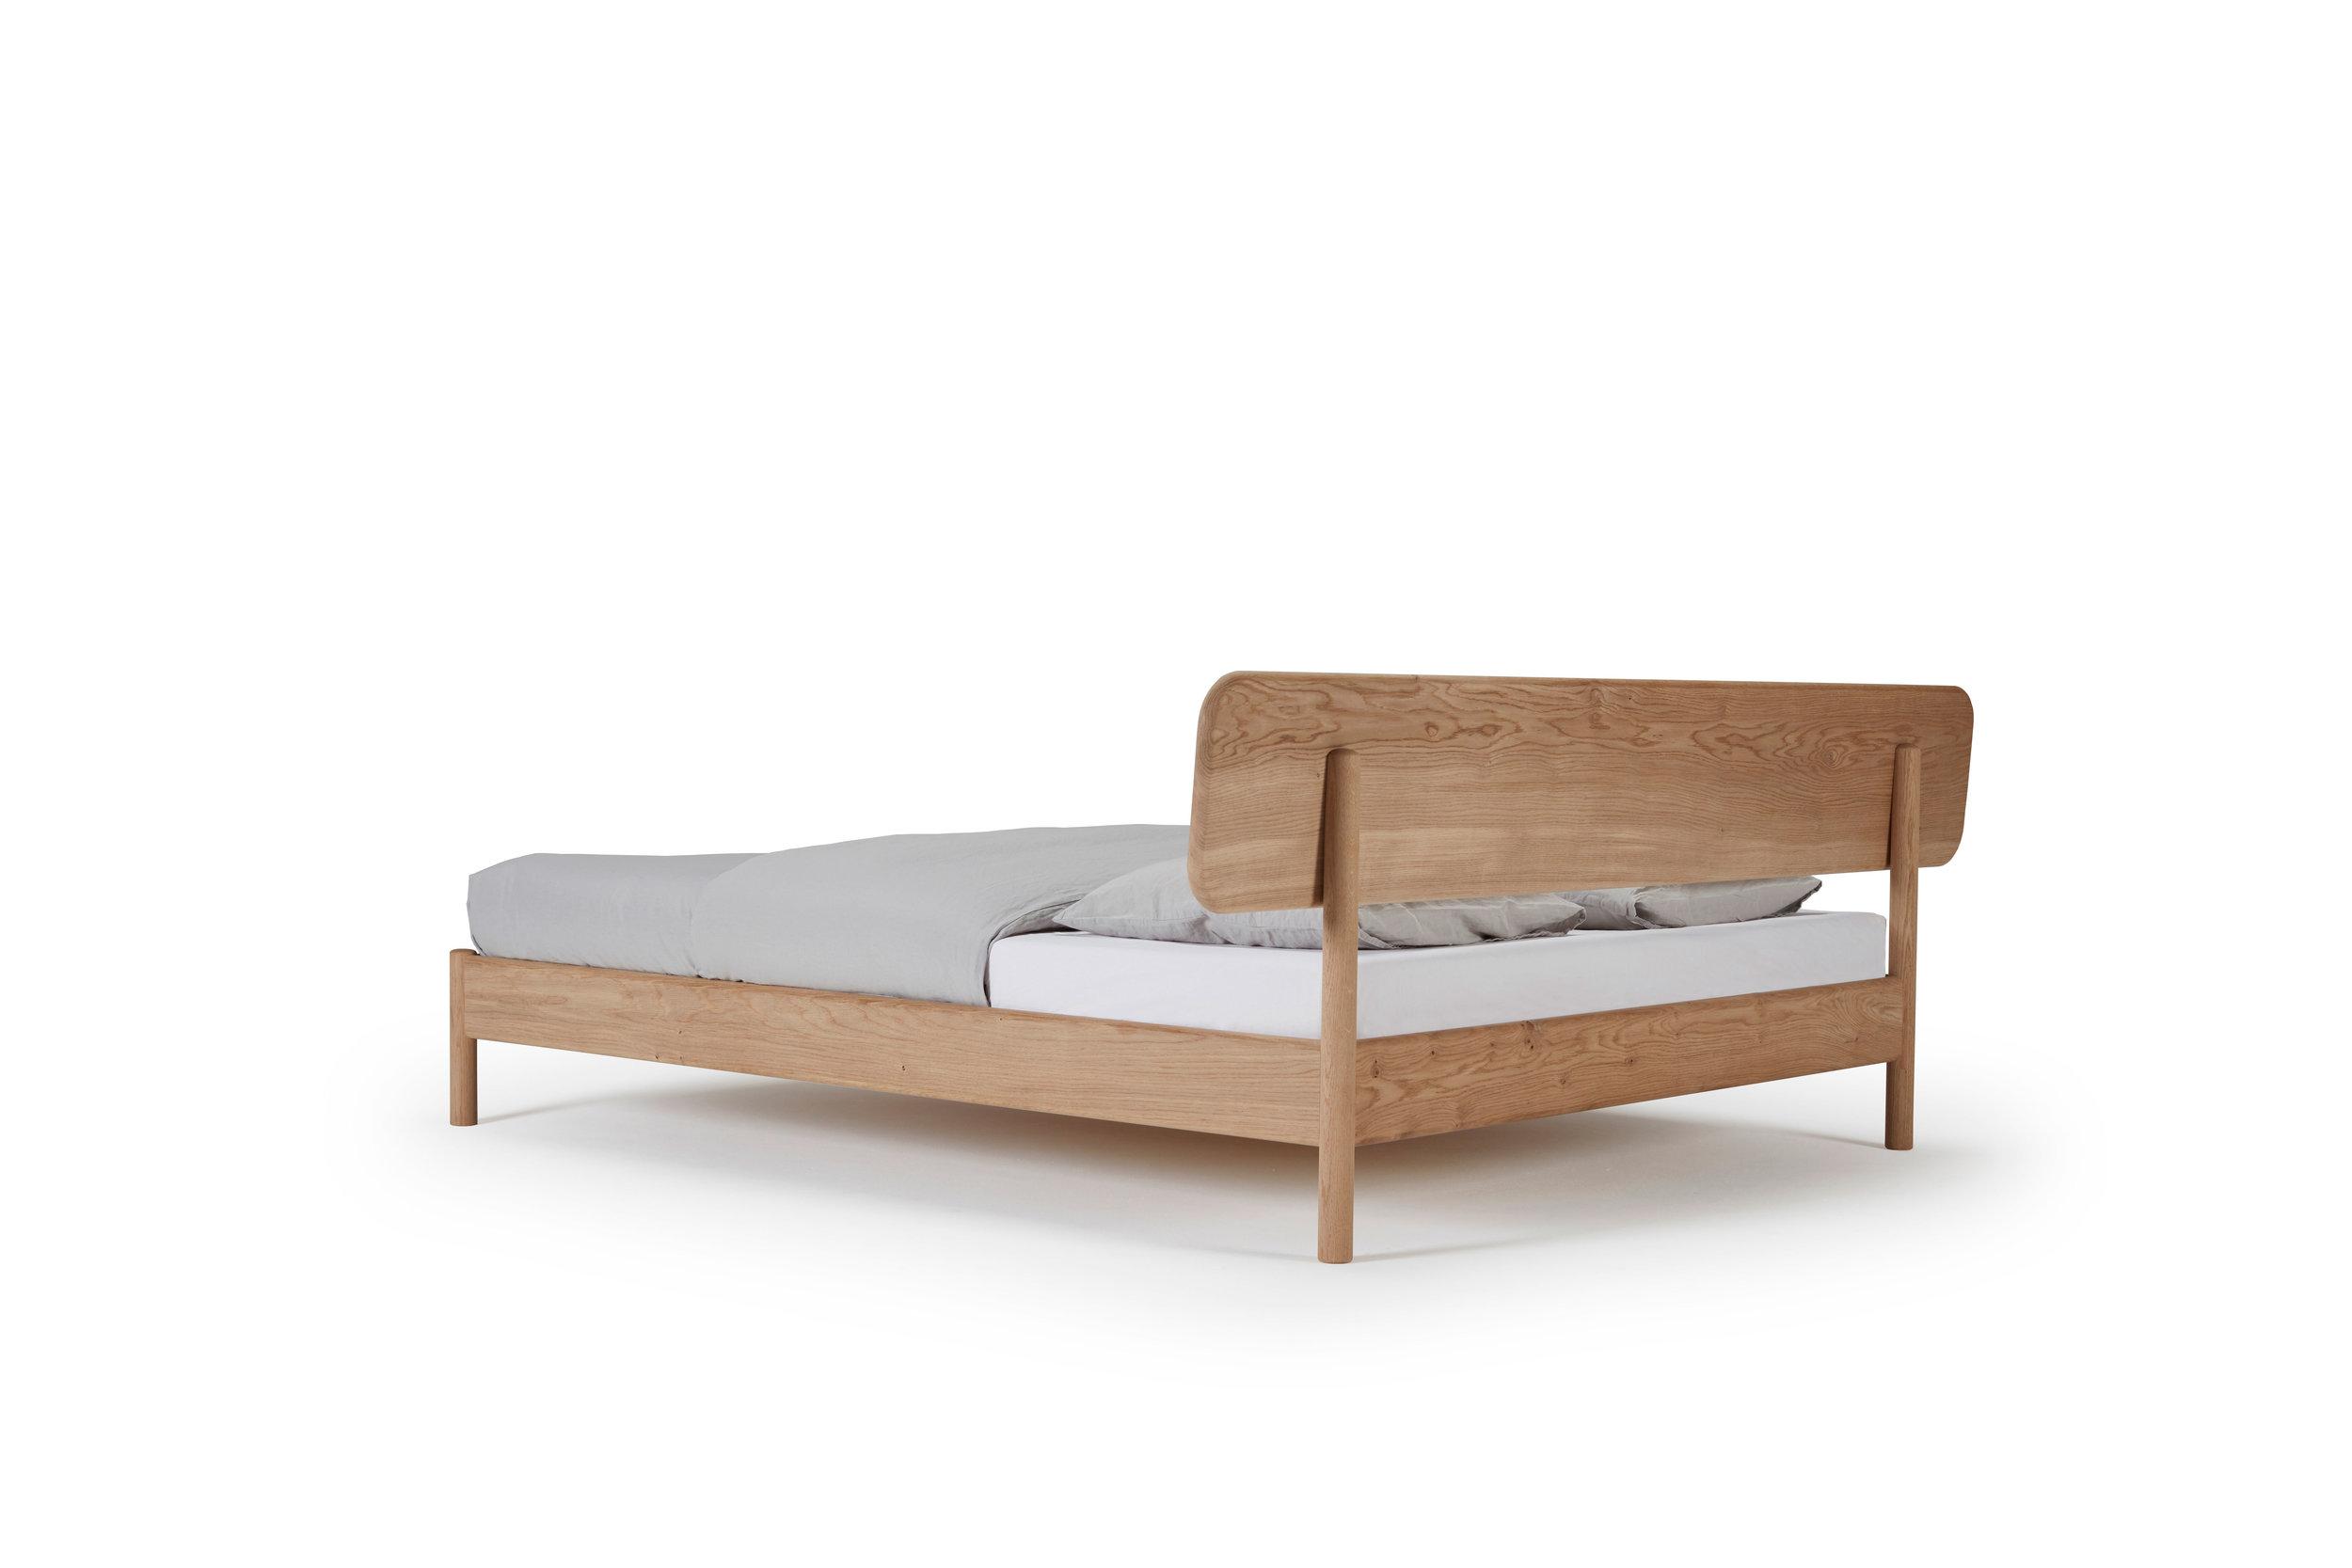 4---ALKEN-BED---RE-BEDS---DESIGN-BY-OLIVER-&-LUKAS-WEISSKROGH.jpg